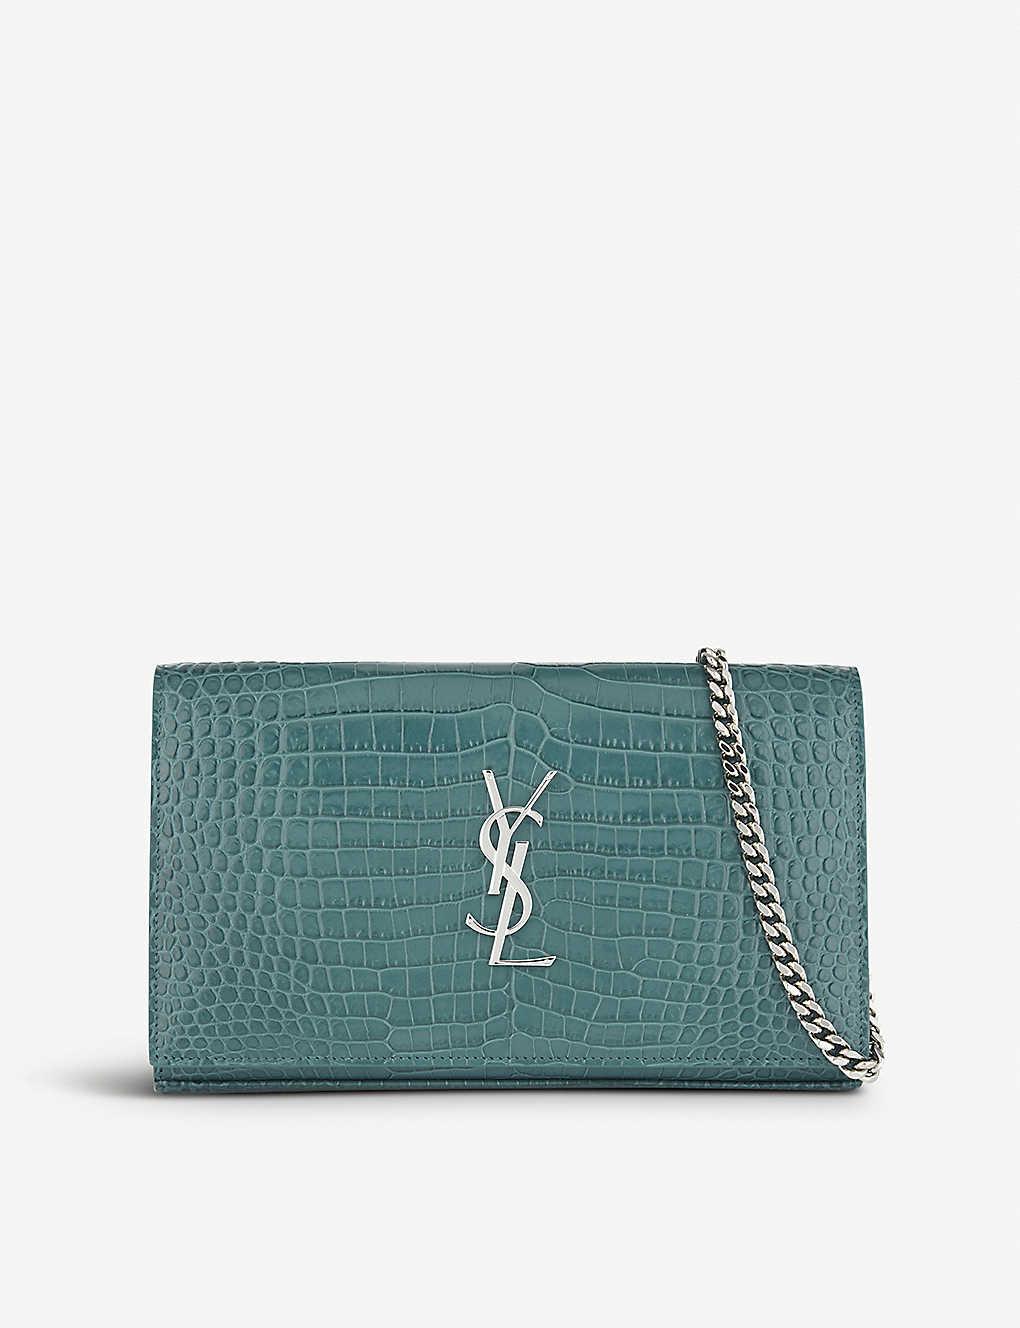 b62cfba33c6 SAINT LAURENT - Croc-embossed leather clutch bag | Selfridges.com